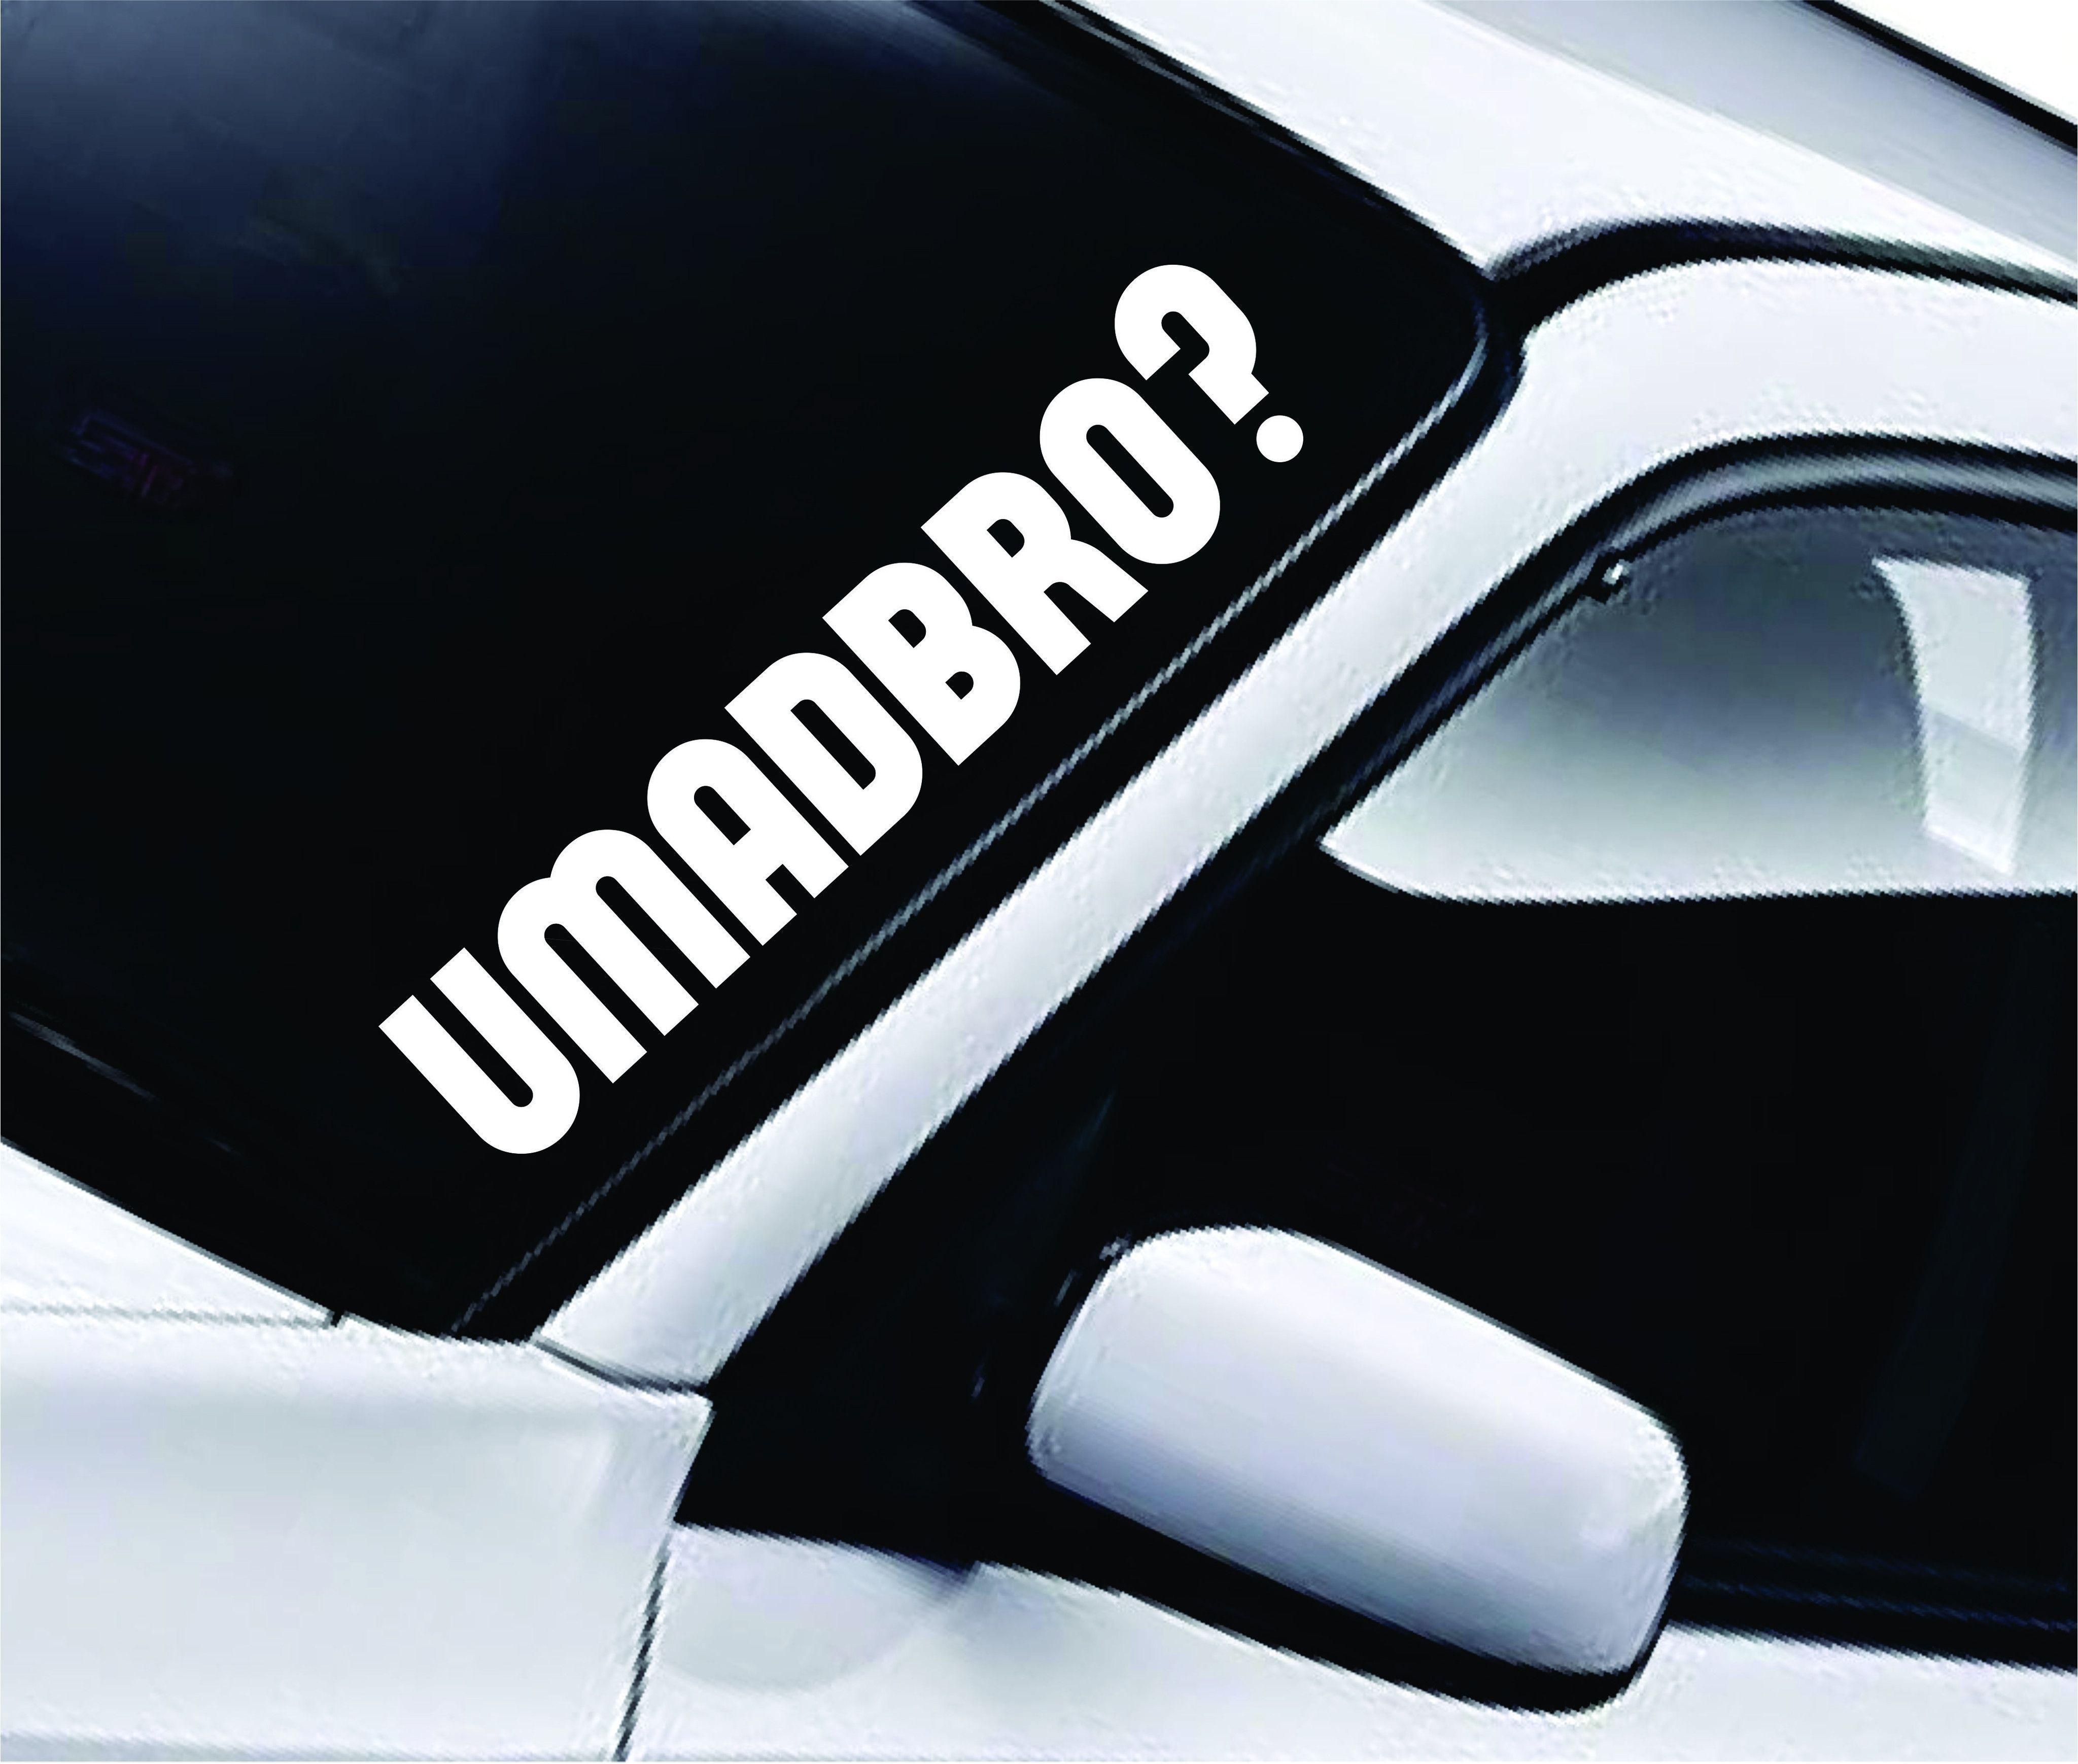 Superb U Mad Bro Large Quote Design Sticker Vinyl Art Words Decor Car Truck JDM  Windshield Race Drift Window